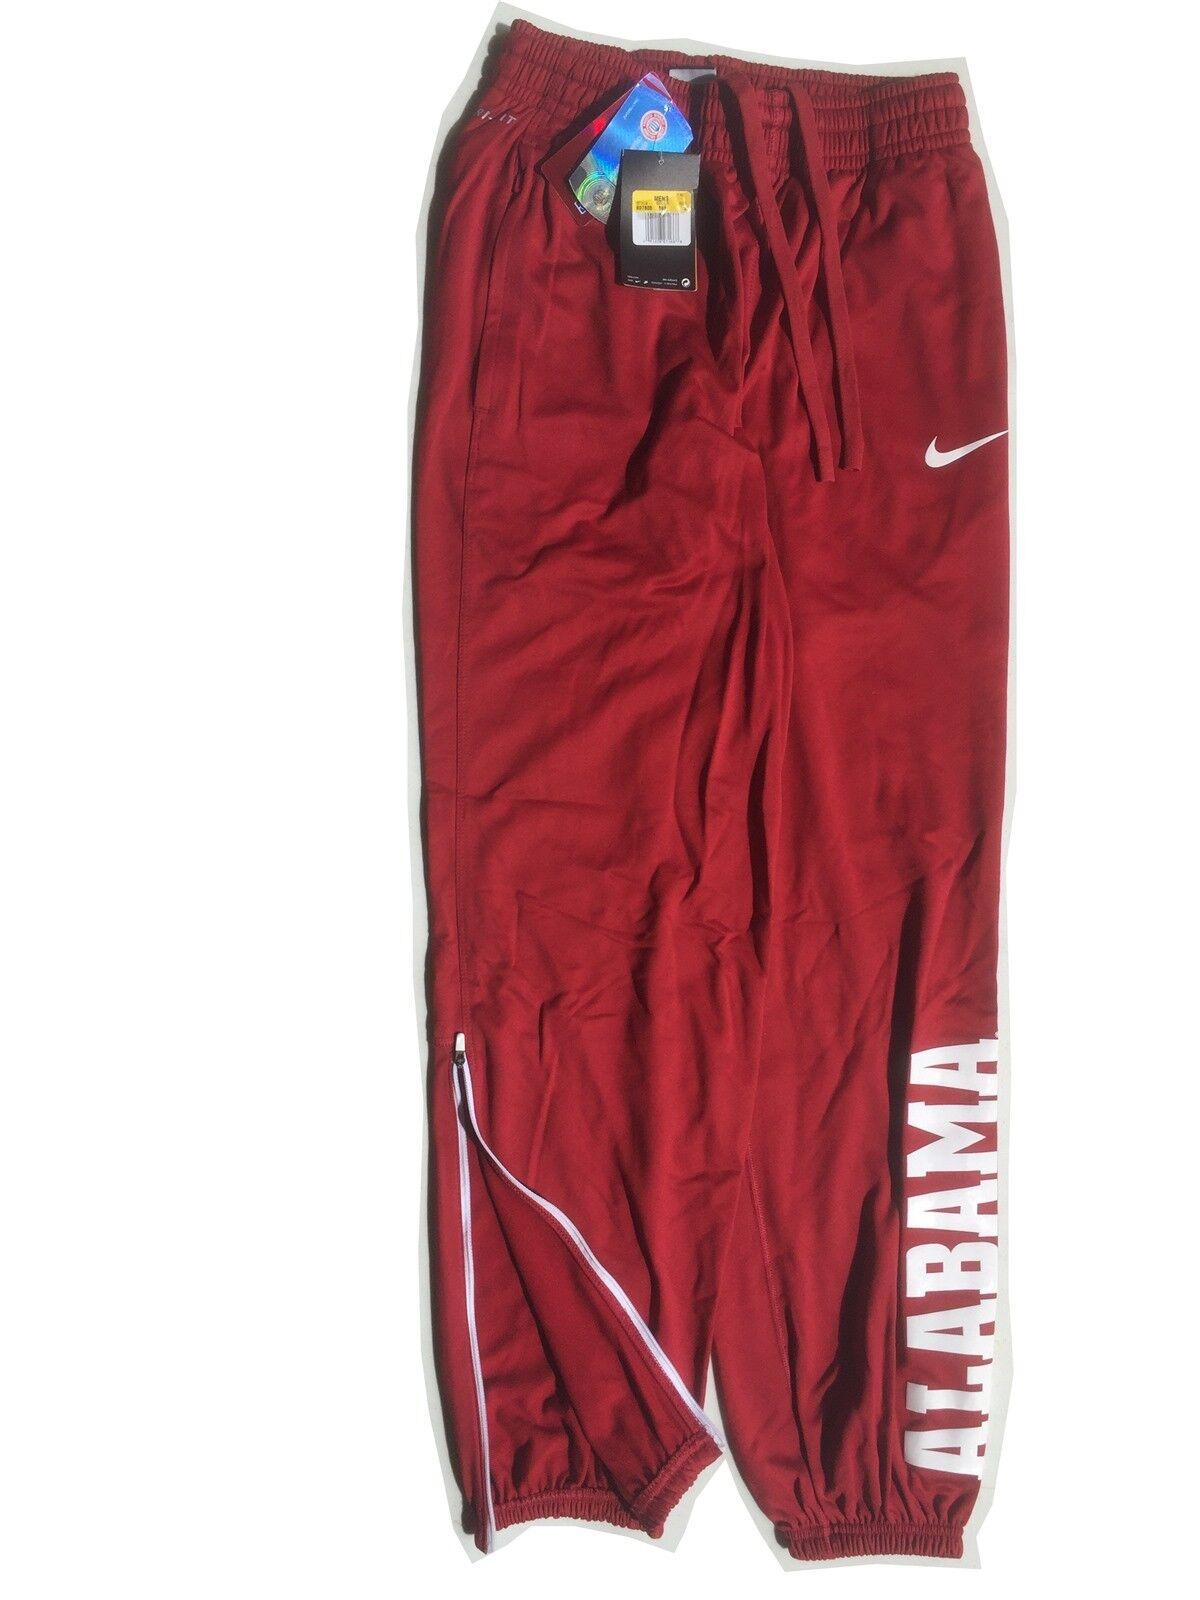 NIKE DRI-FIT Team Issue Basketball Sports Pants Alabama Crimson Tide SZ Small